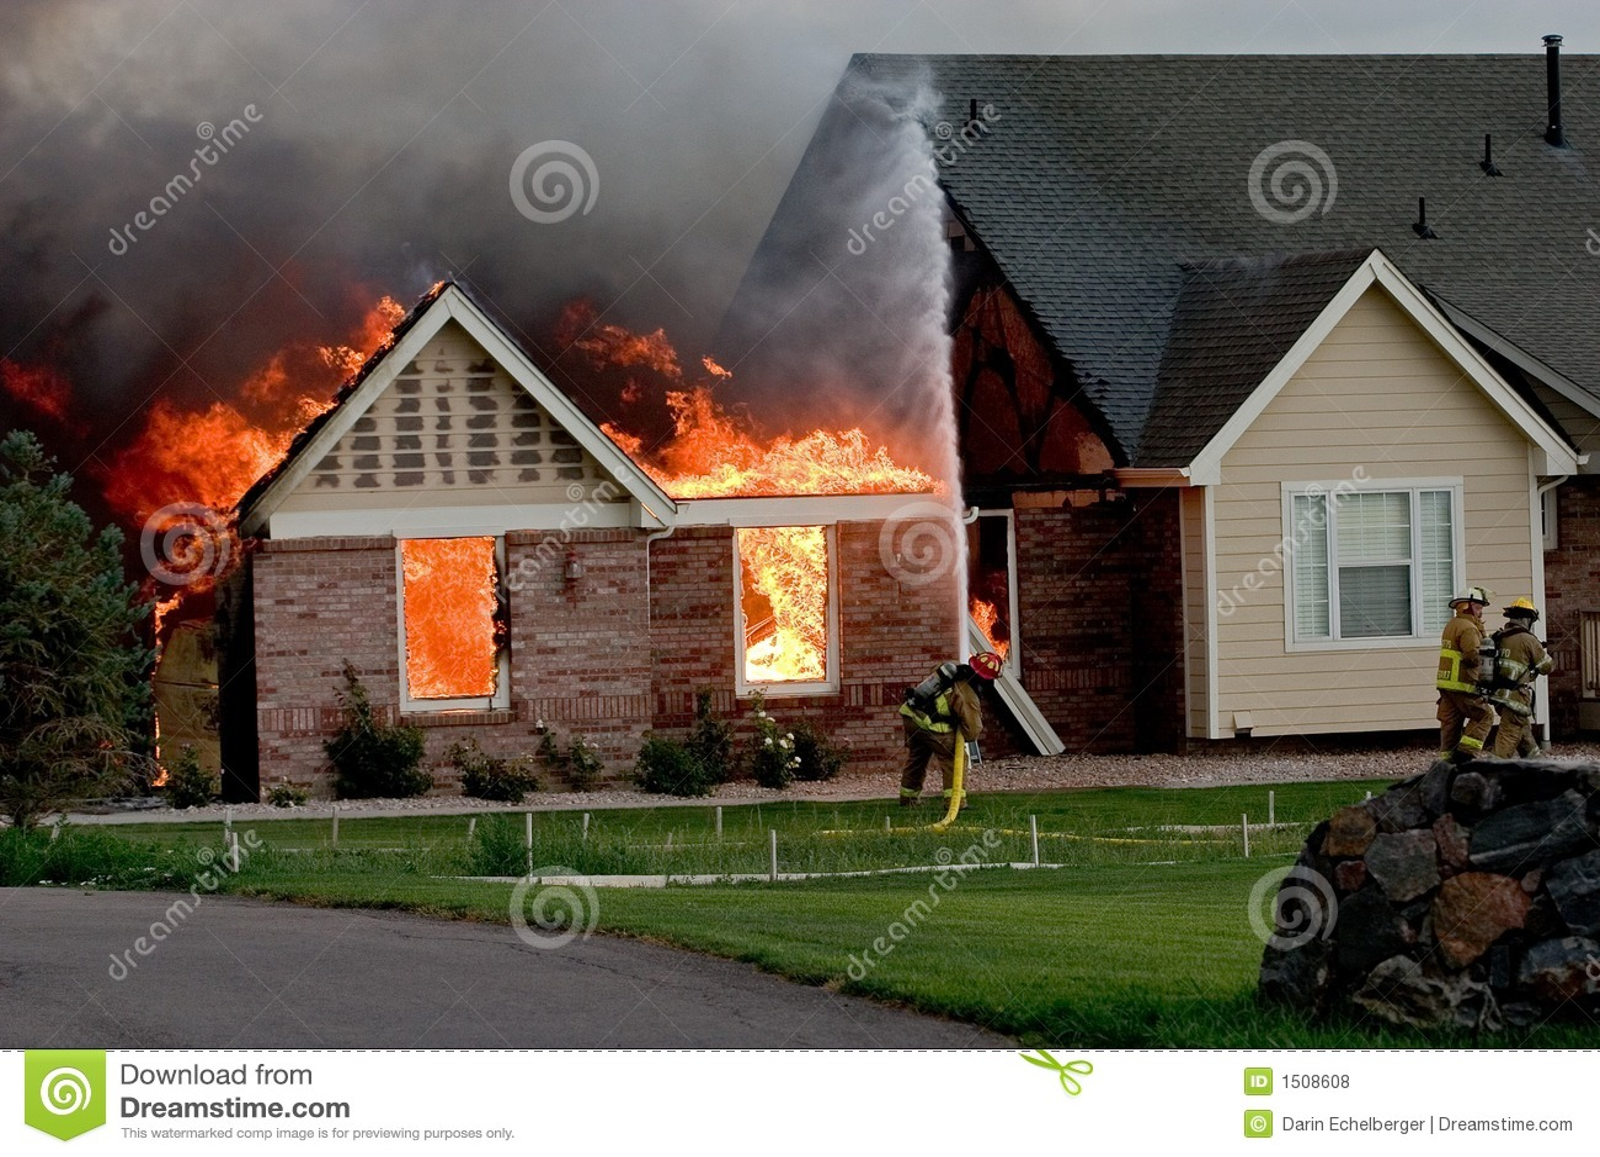 House fire 4